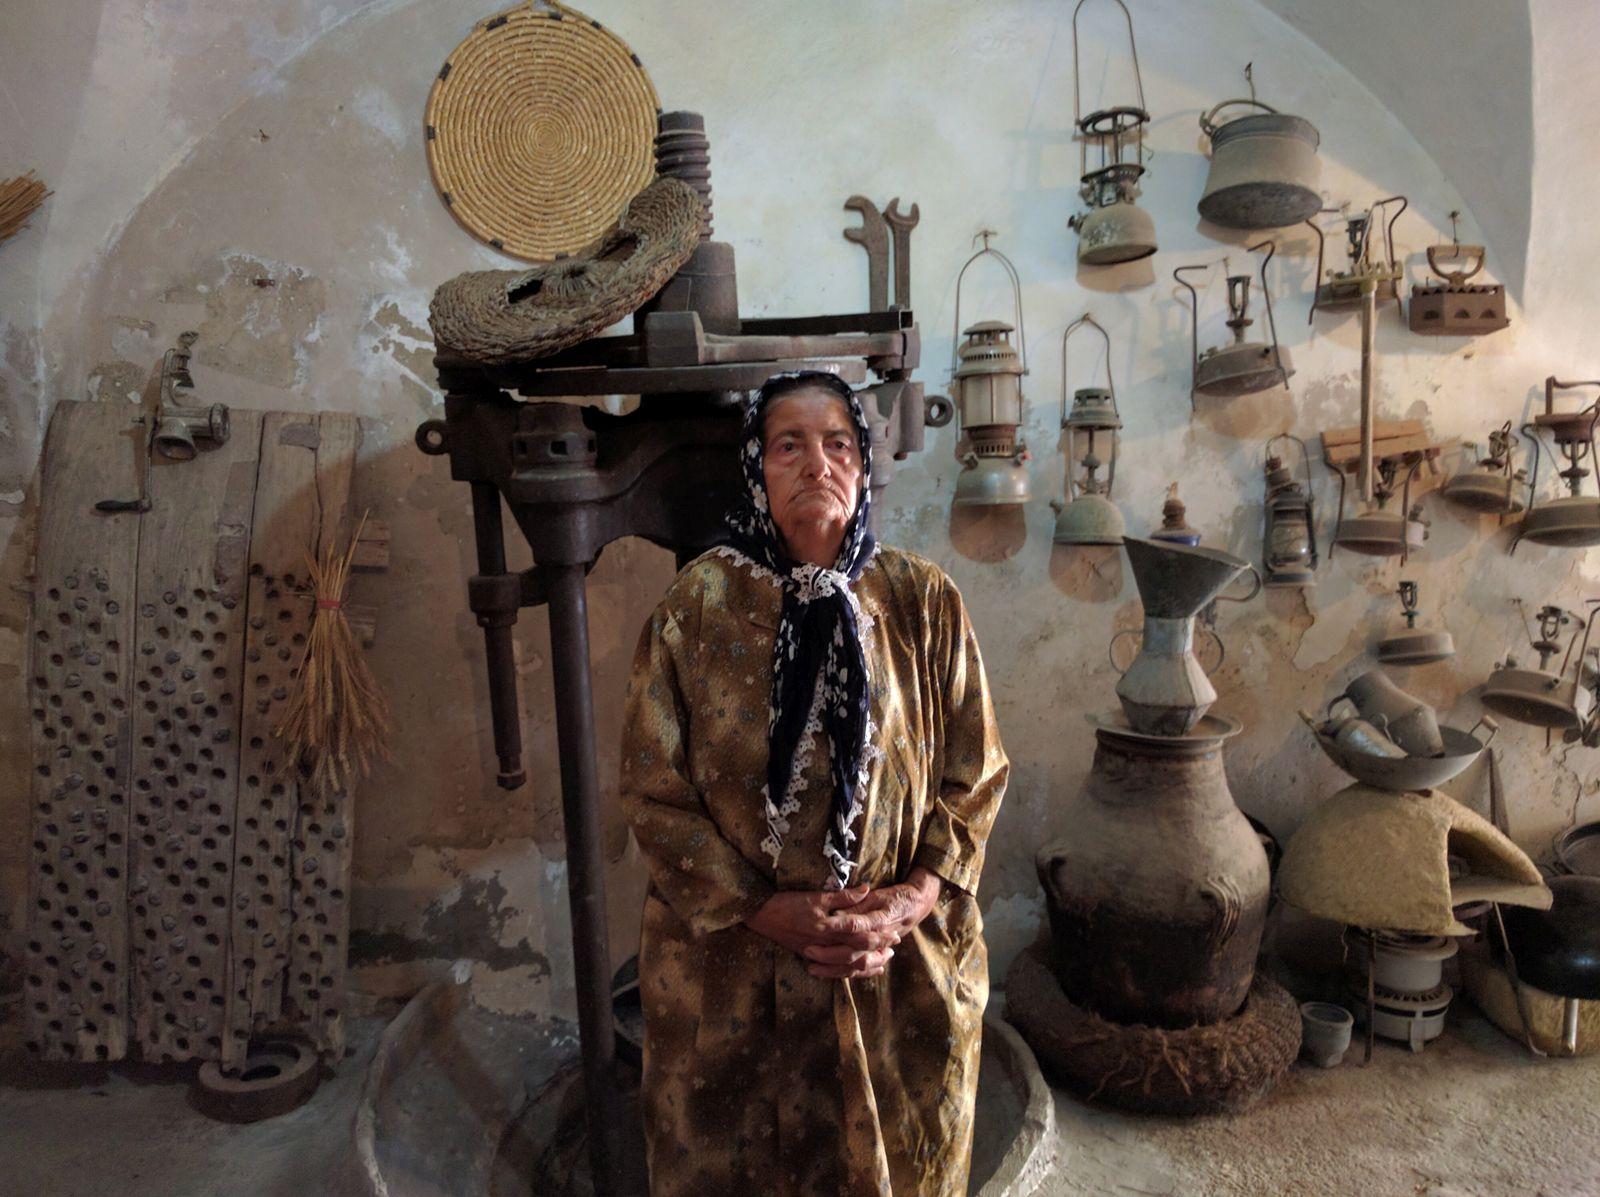 Nagma Huri welcomes visitors to her Deir Hanna olive press. Photo by Viva Sarah Press